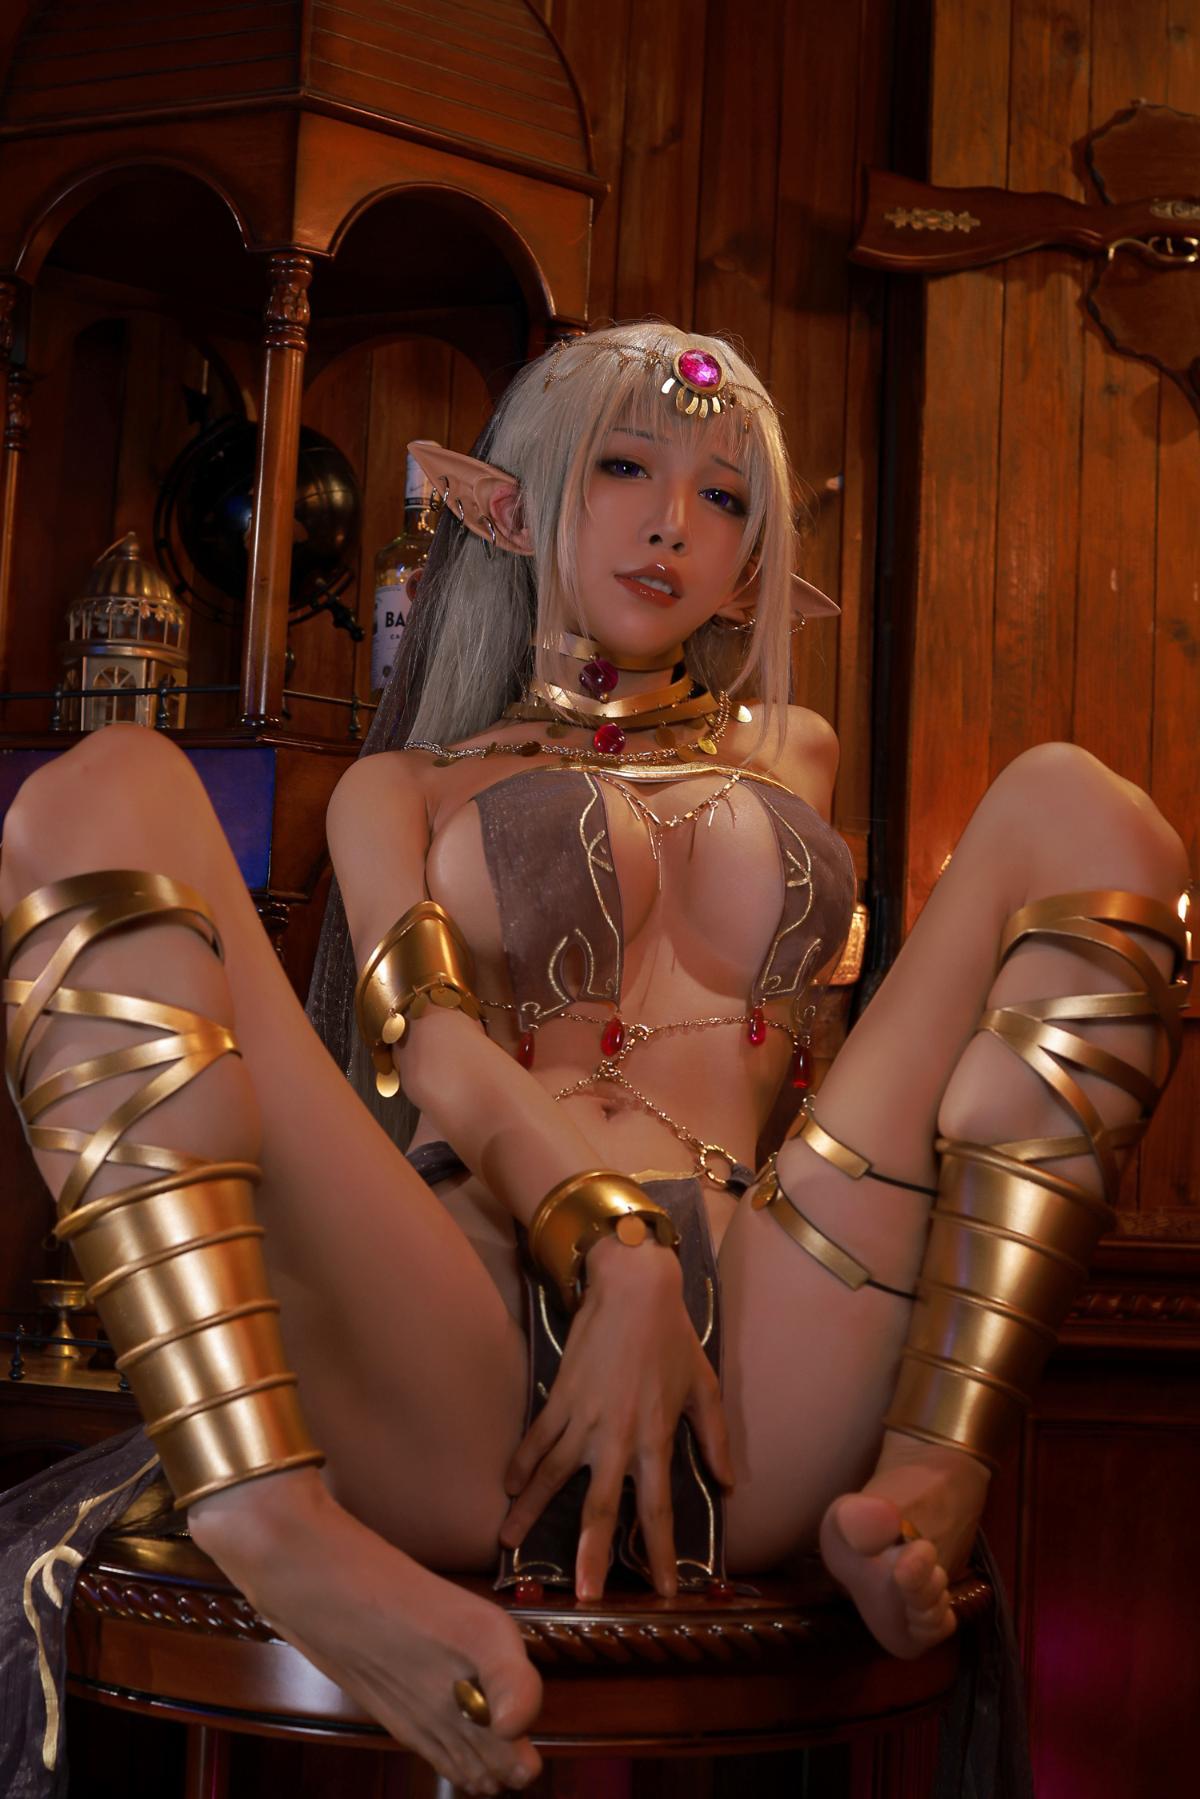 Tan Dancer Elf Succubus Cosplay by Aqua 17